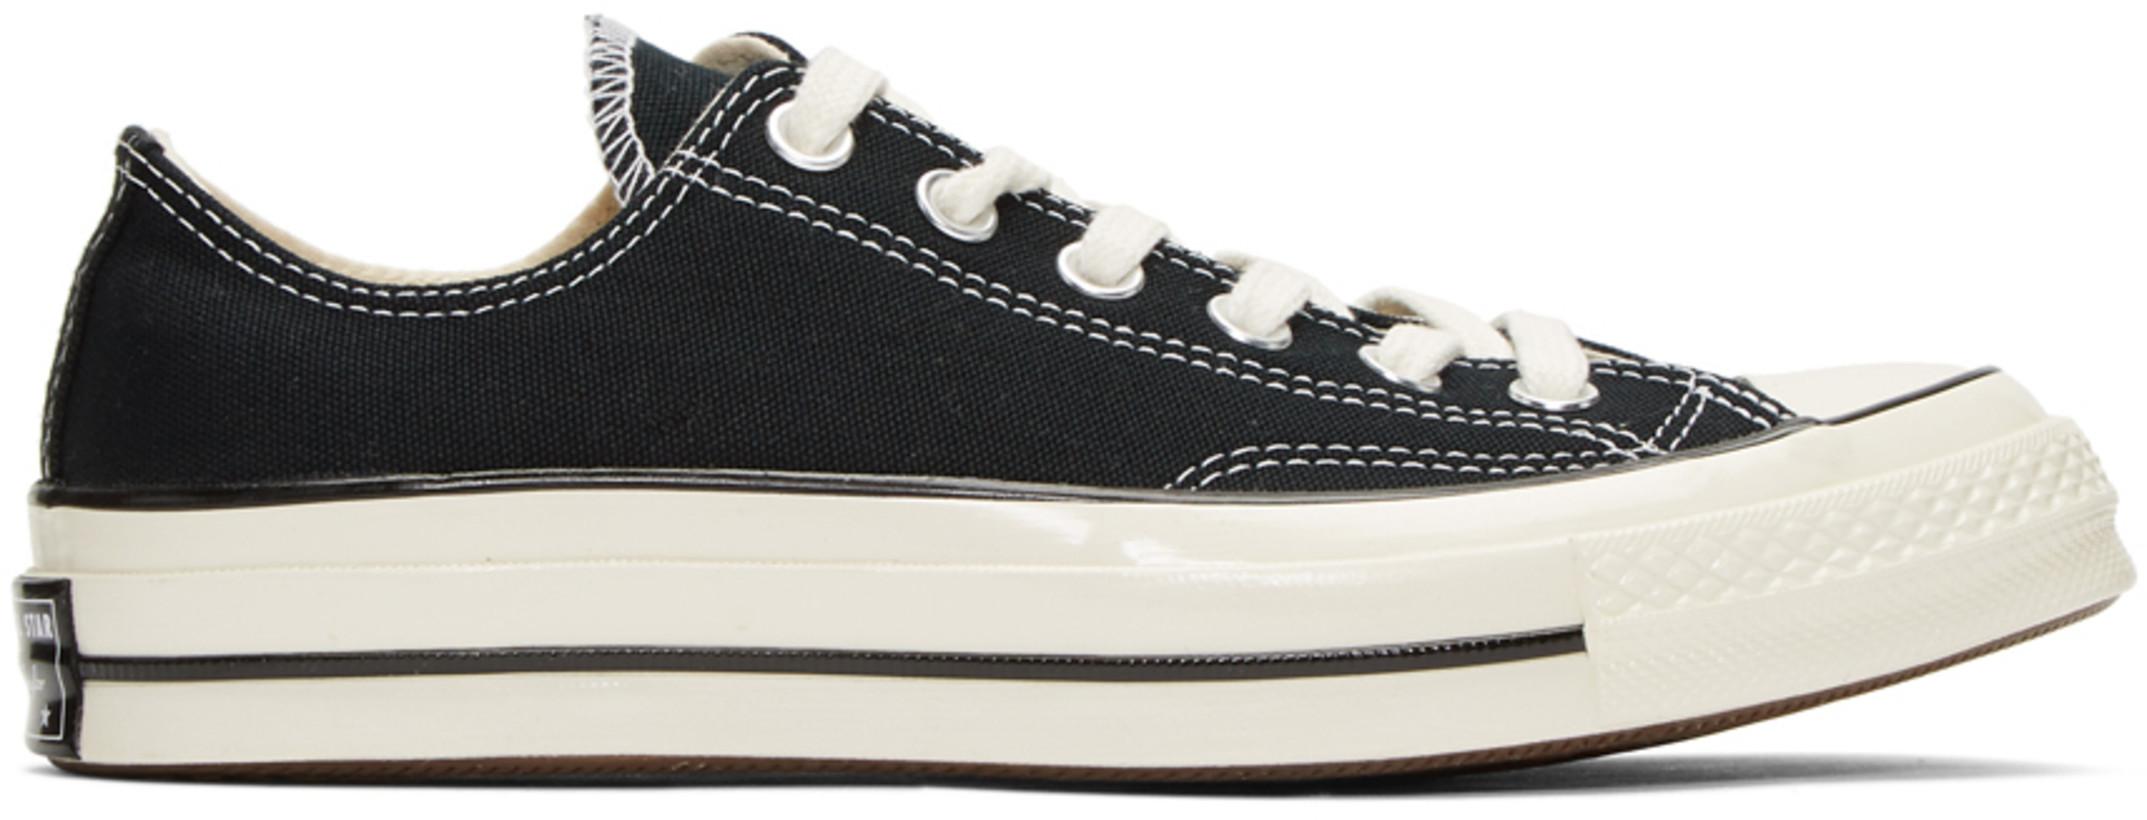 Converse ブラック Chuck 70 ロー スニーカー メンズ ¥8904 JPY